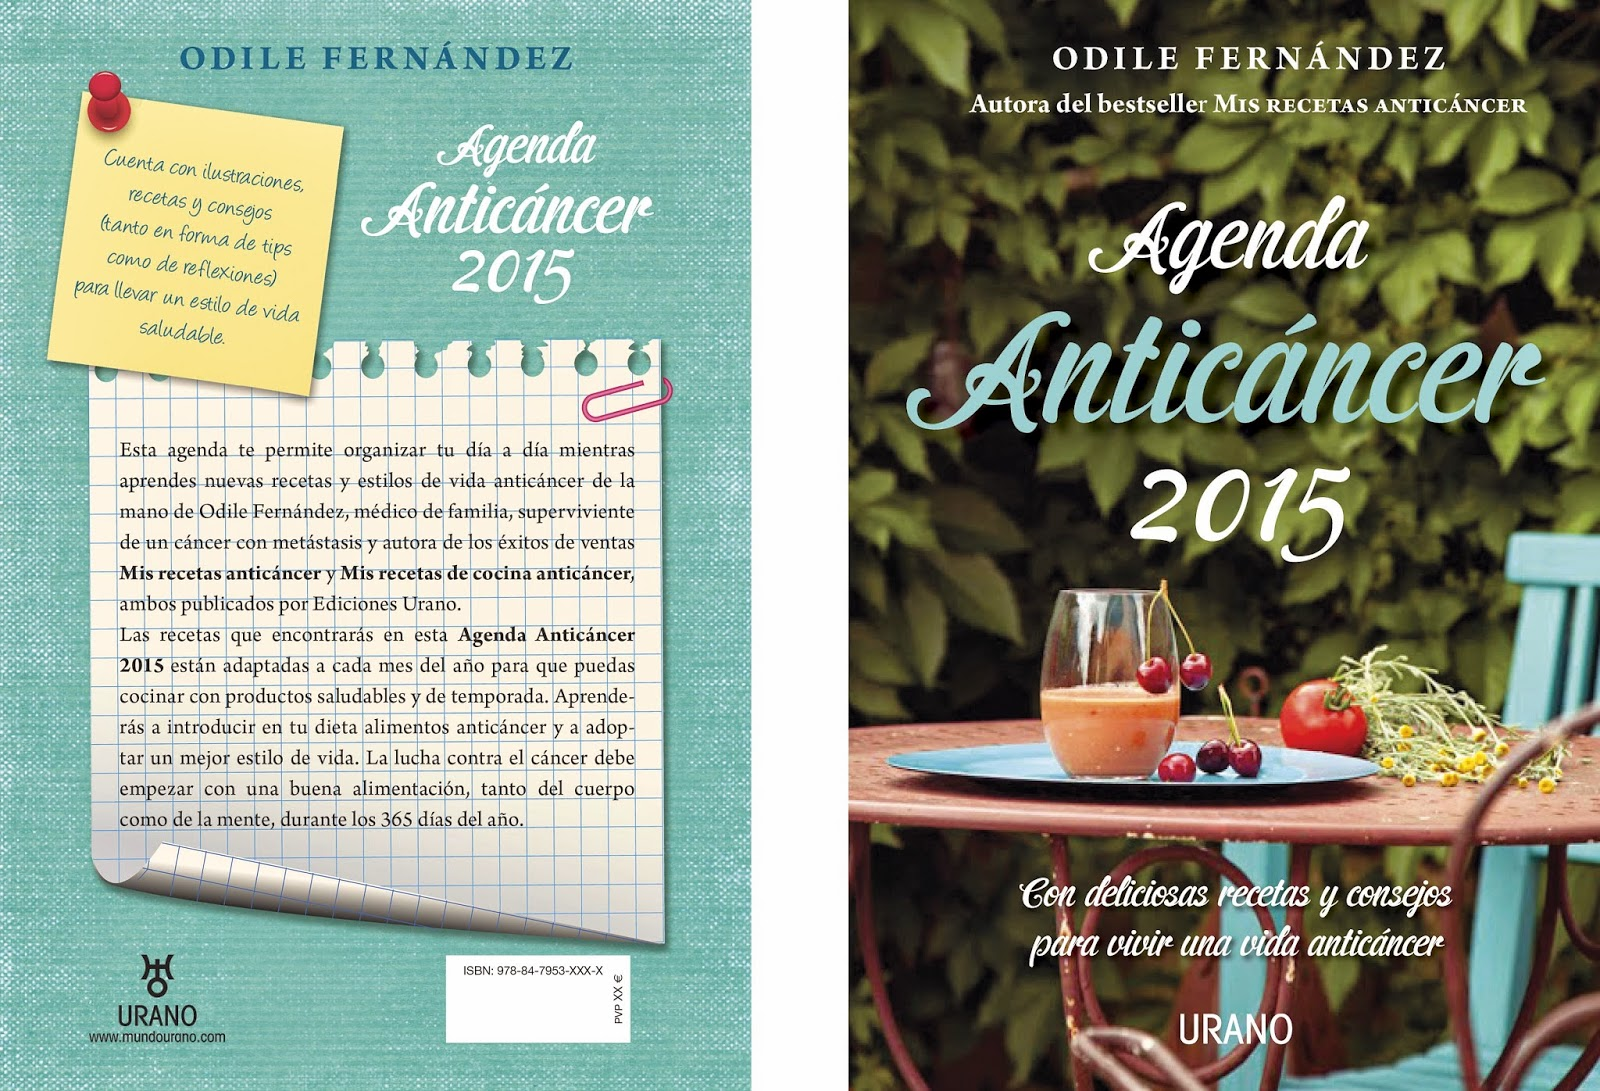 odile fernandez, anticancer, cancer, alimentacion, agenda